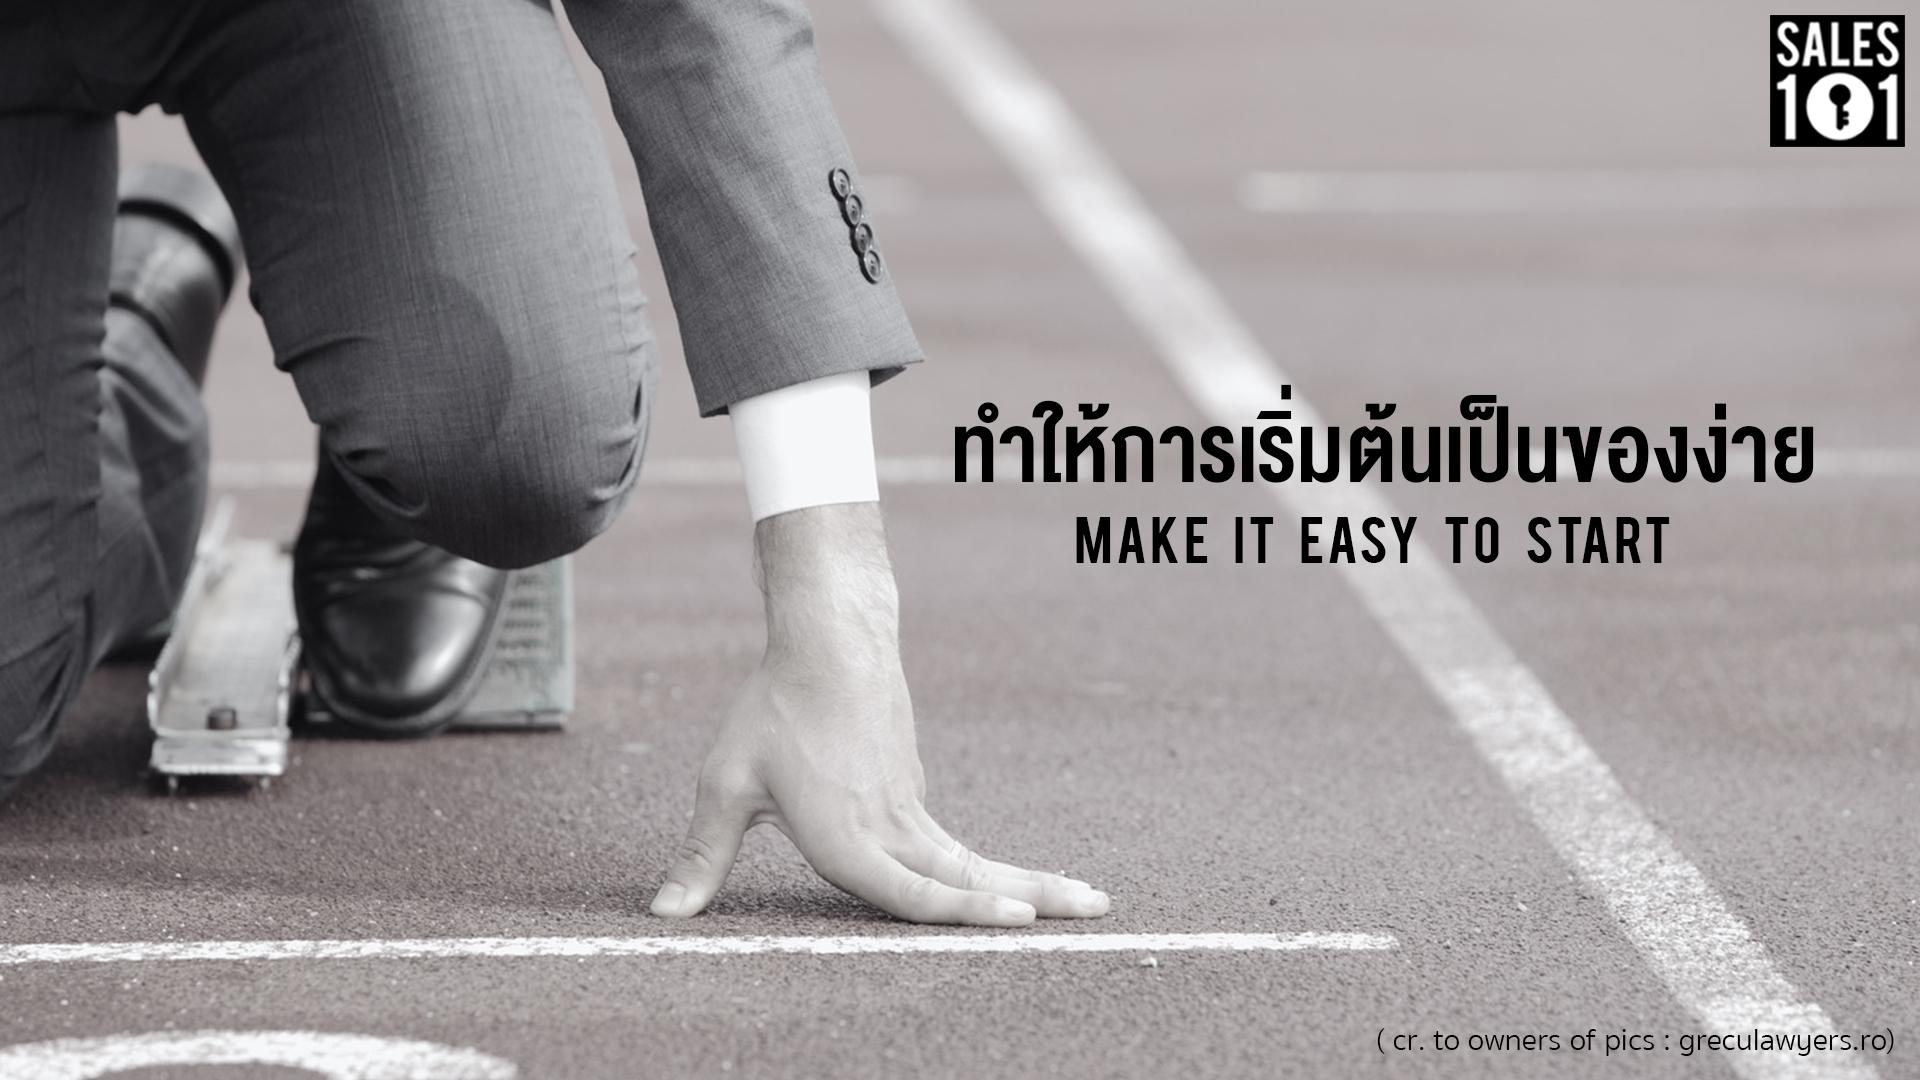 Make It Easy to Start